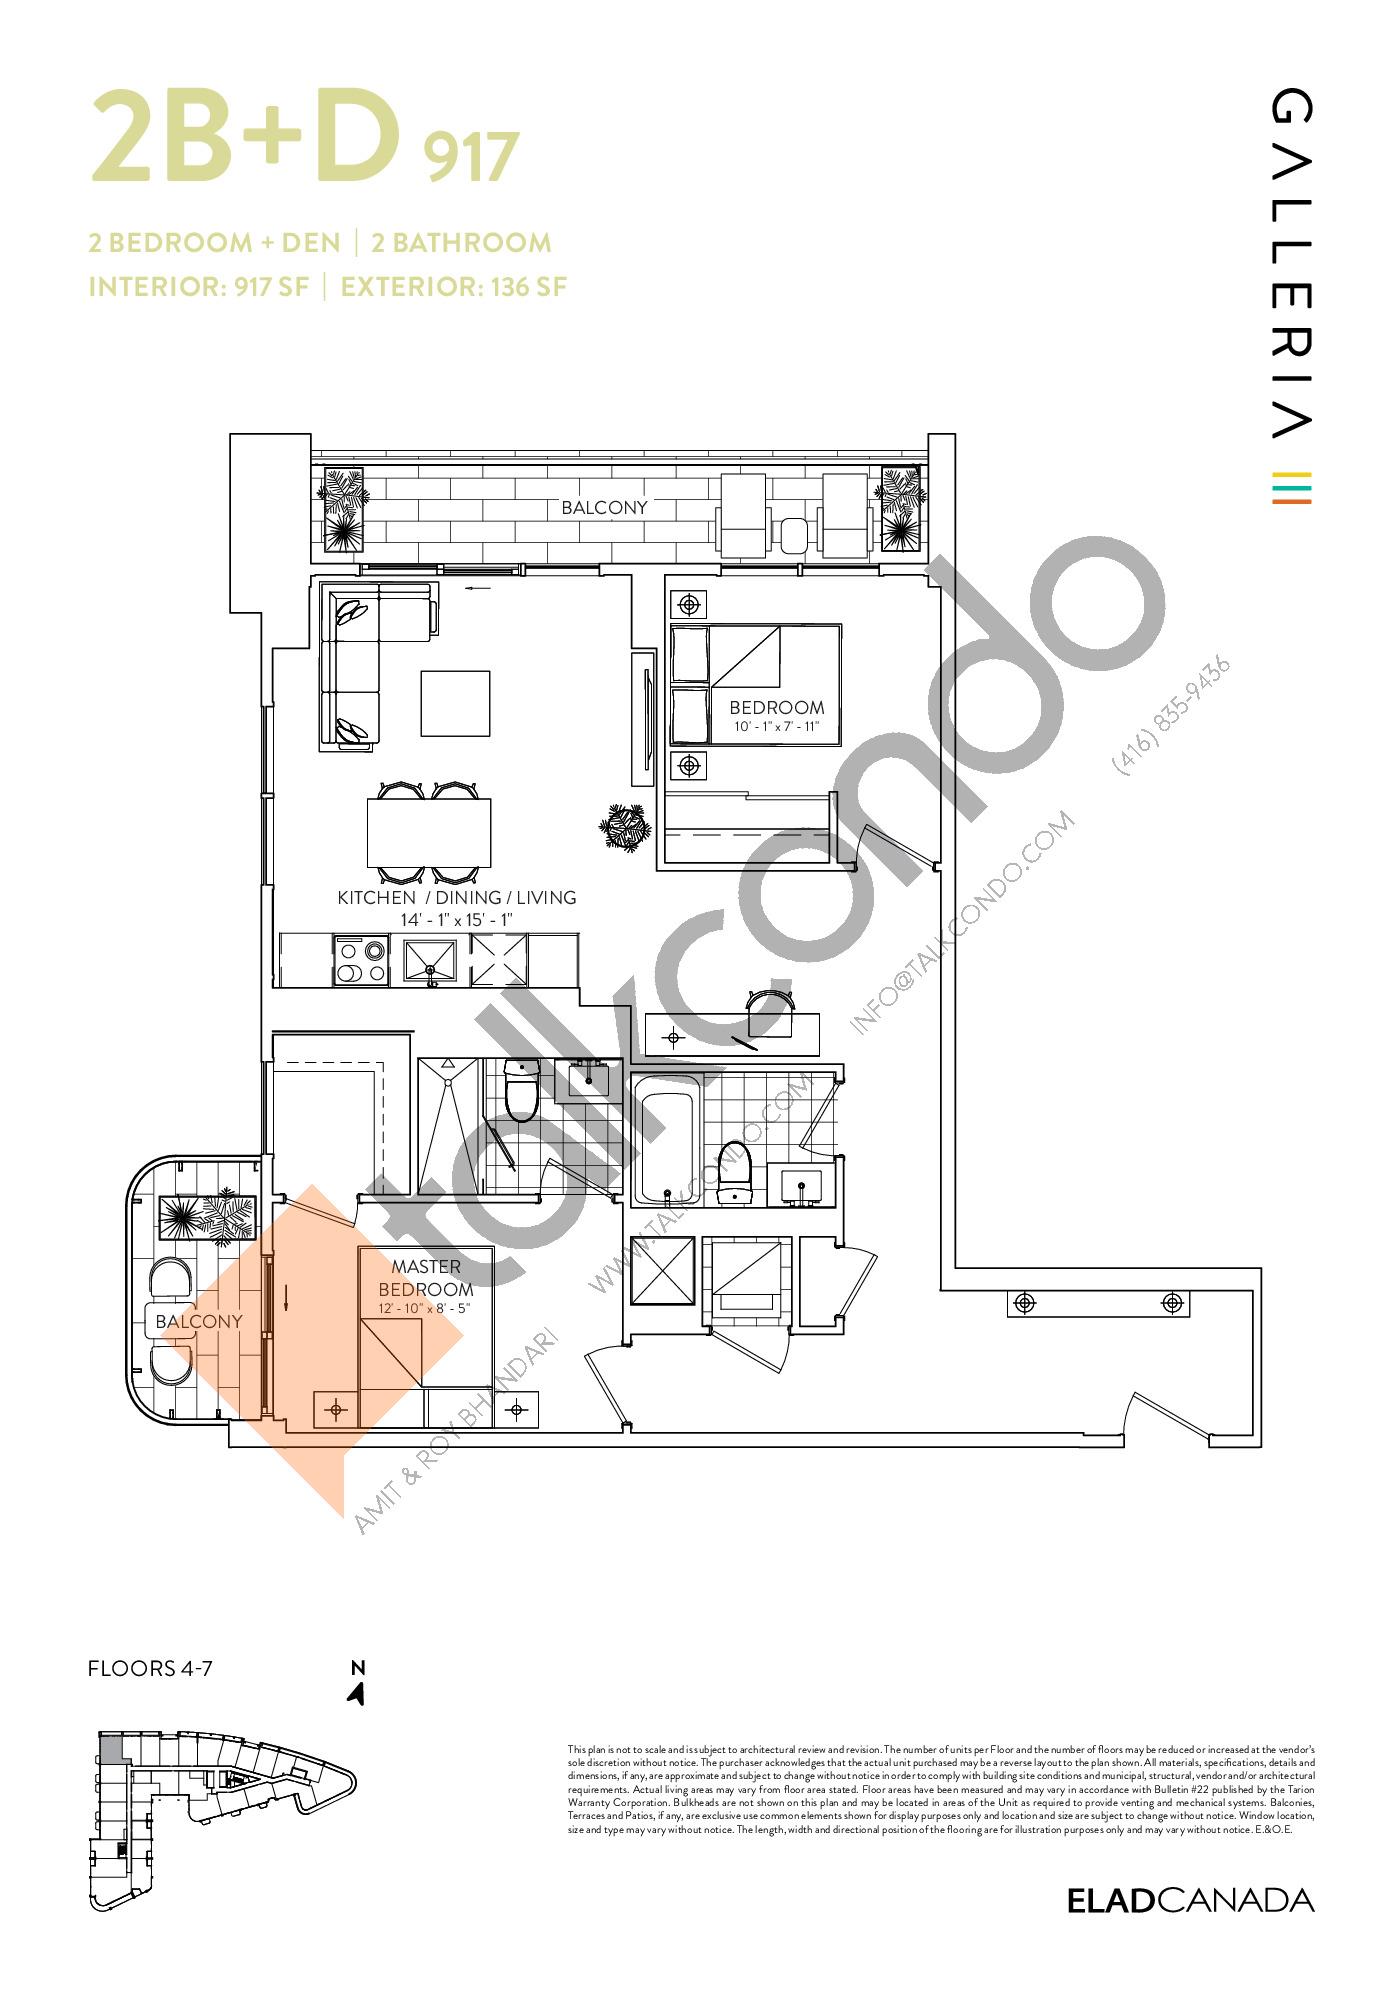 2B+D 917 Floor Plan at Galleria 03 Condos - 917 sq.ft